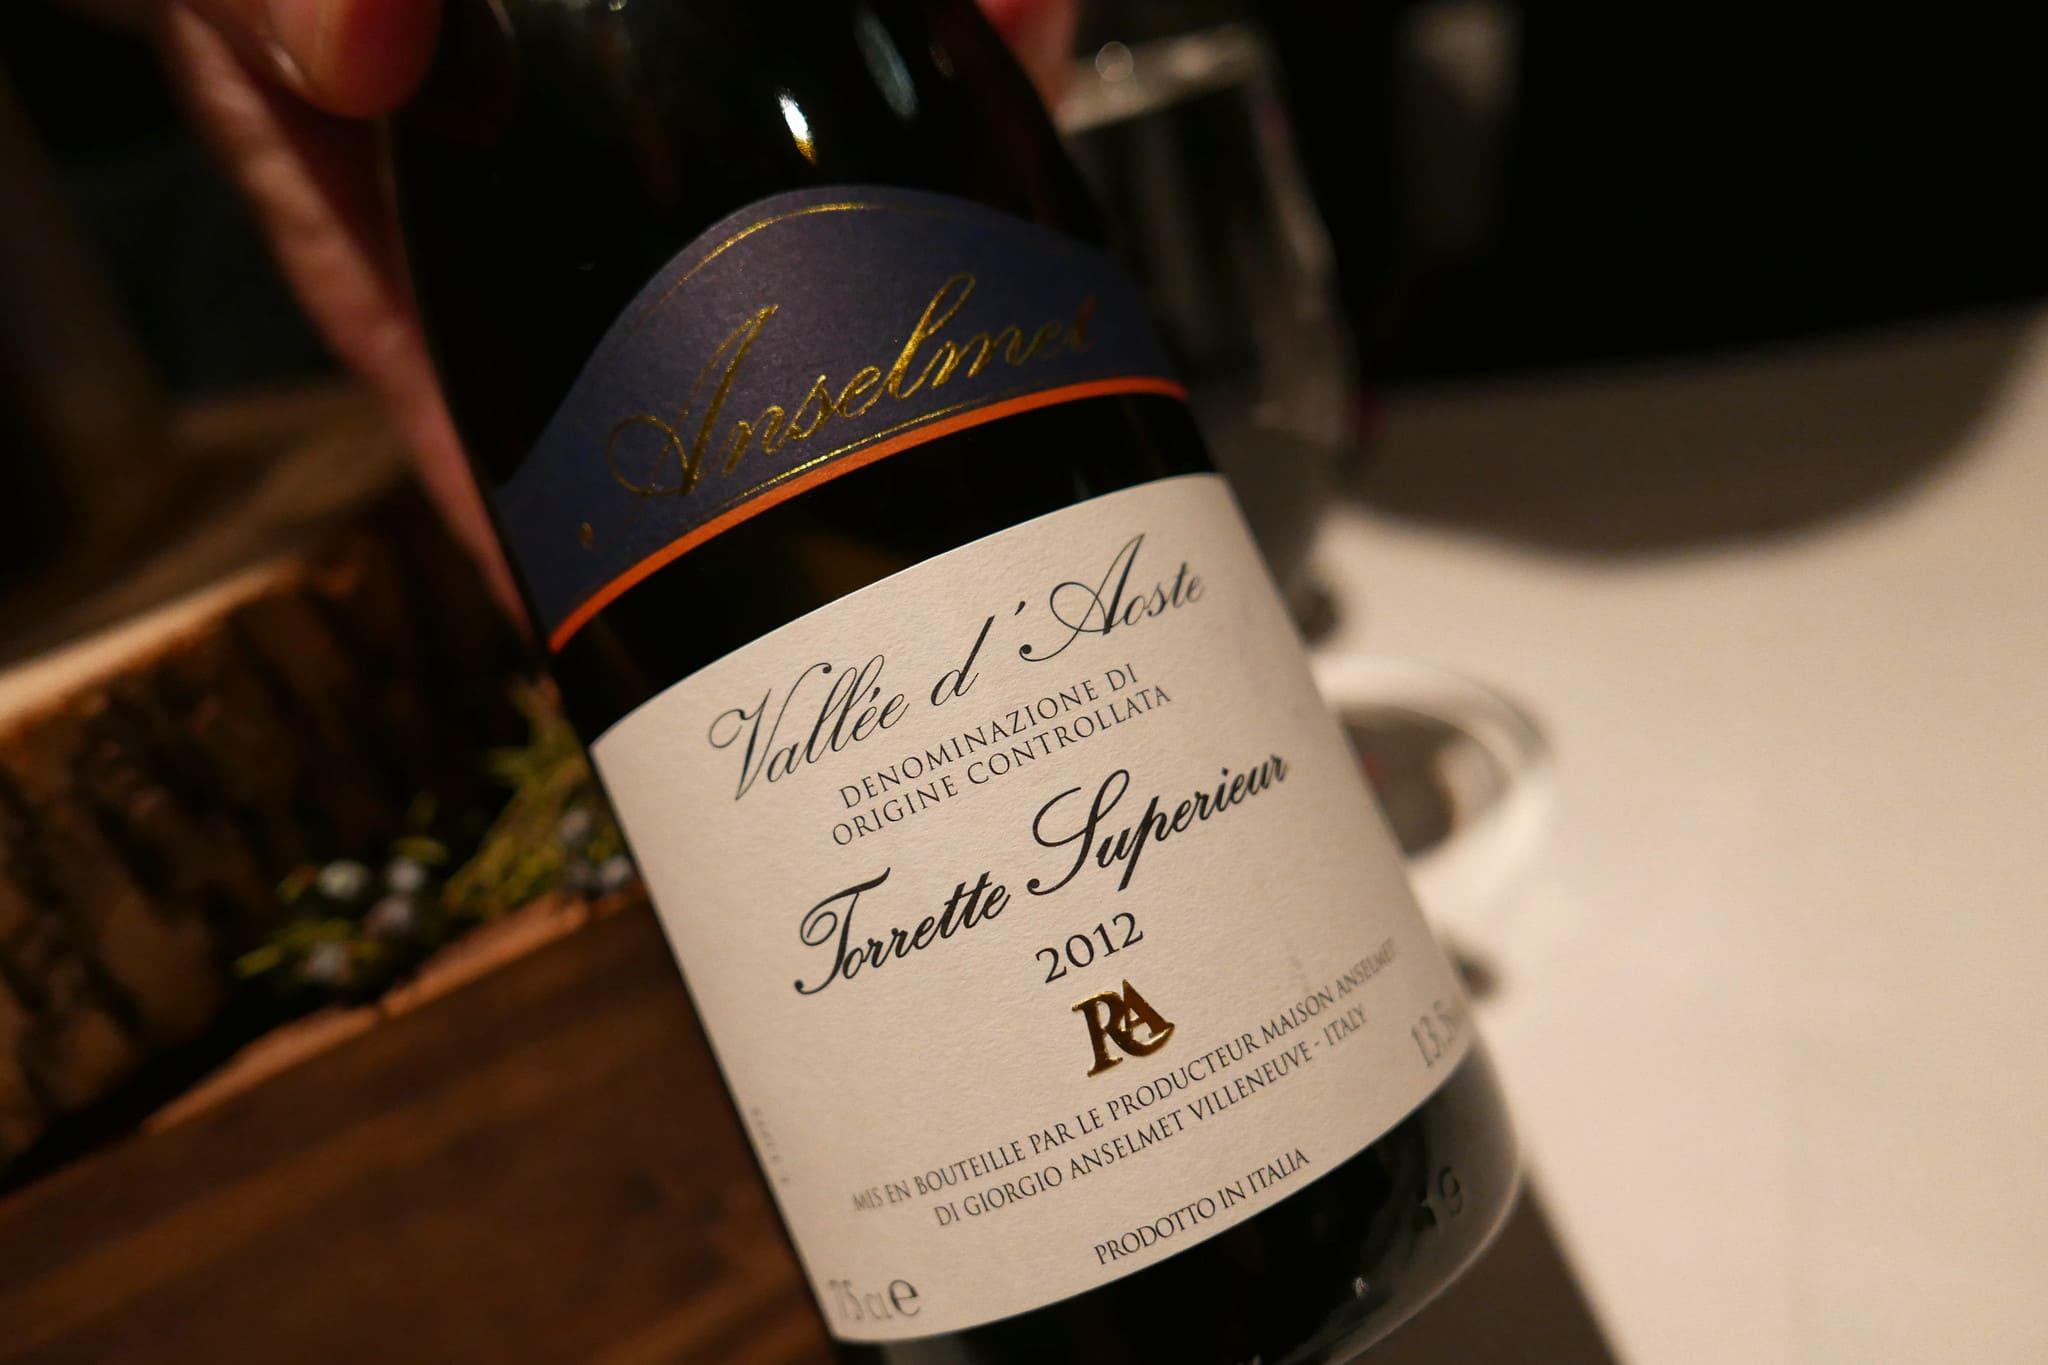 vino tipi della valle d'aosta